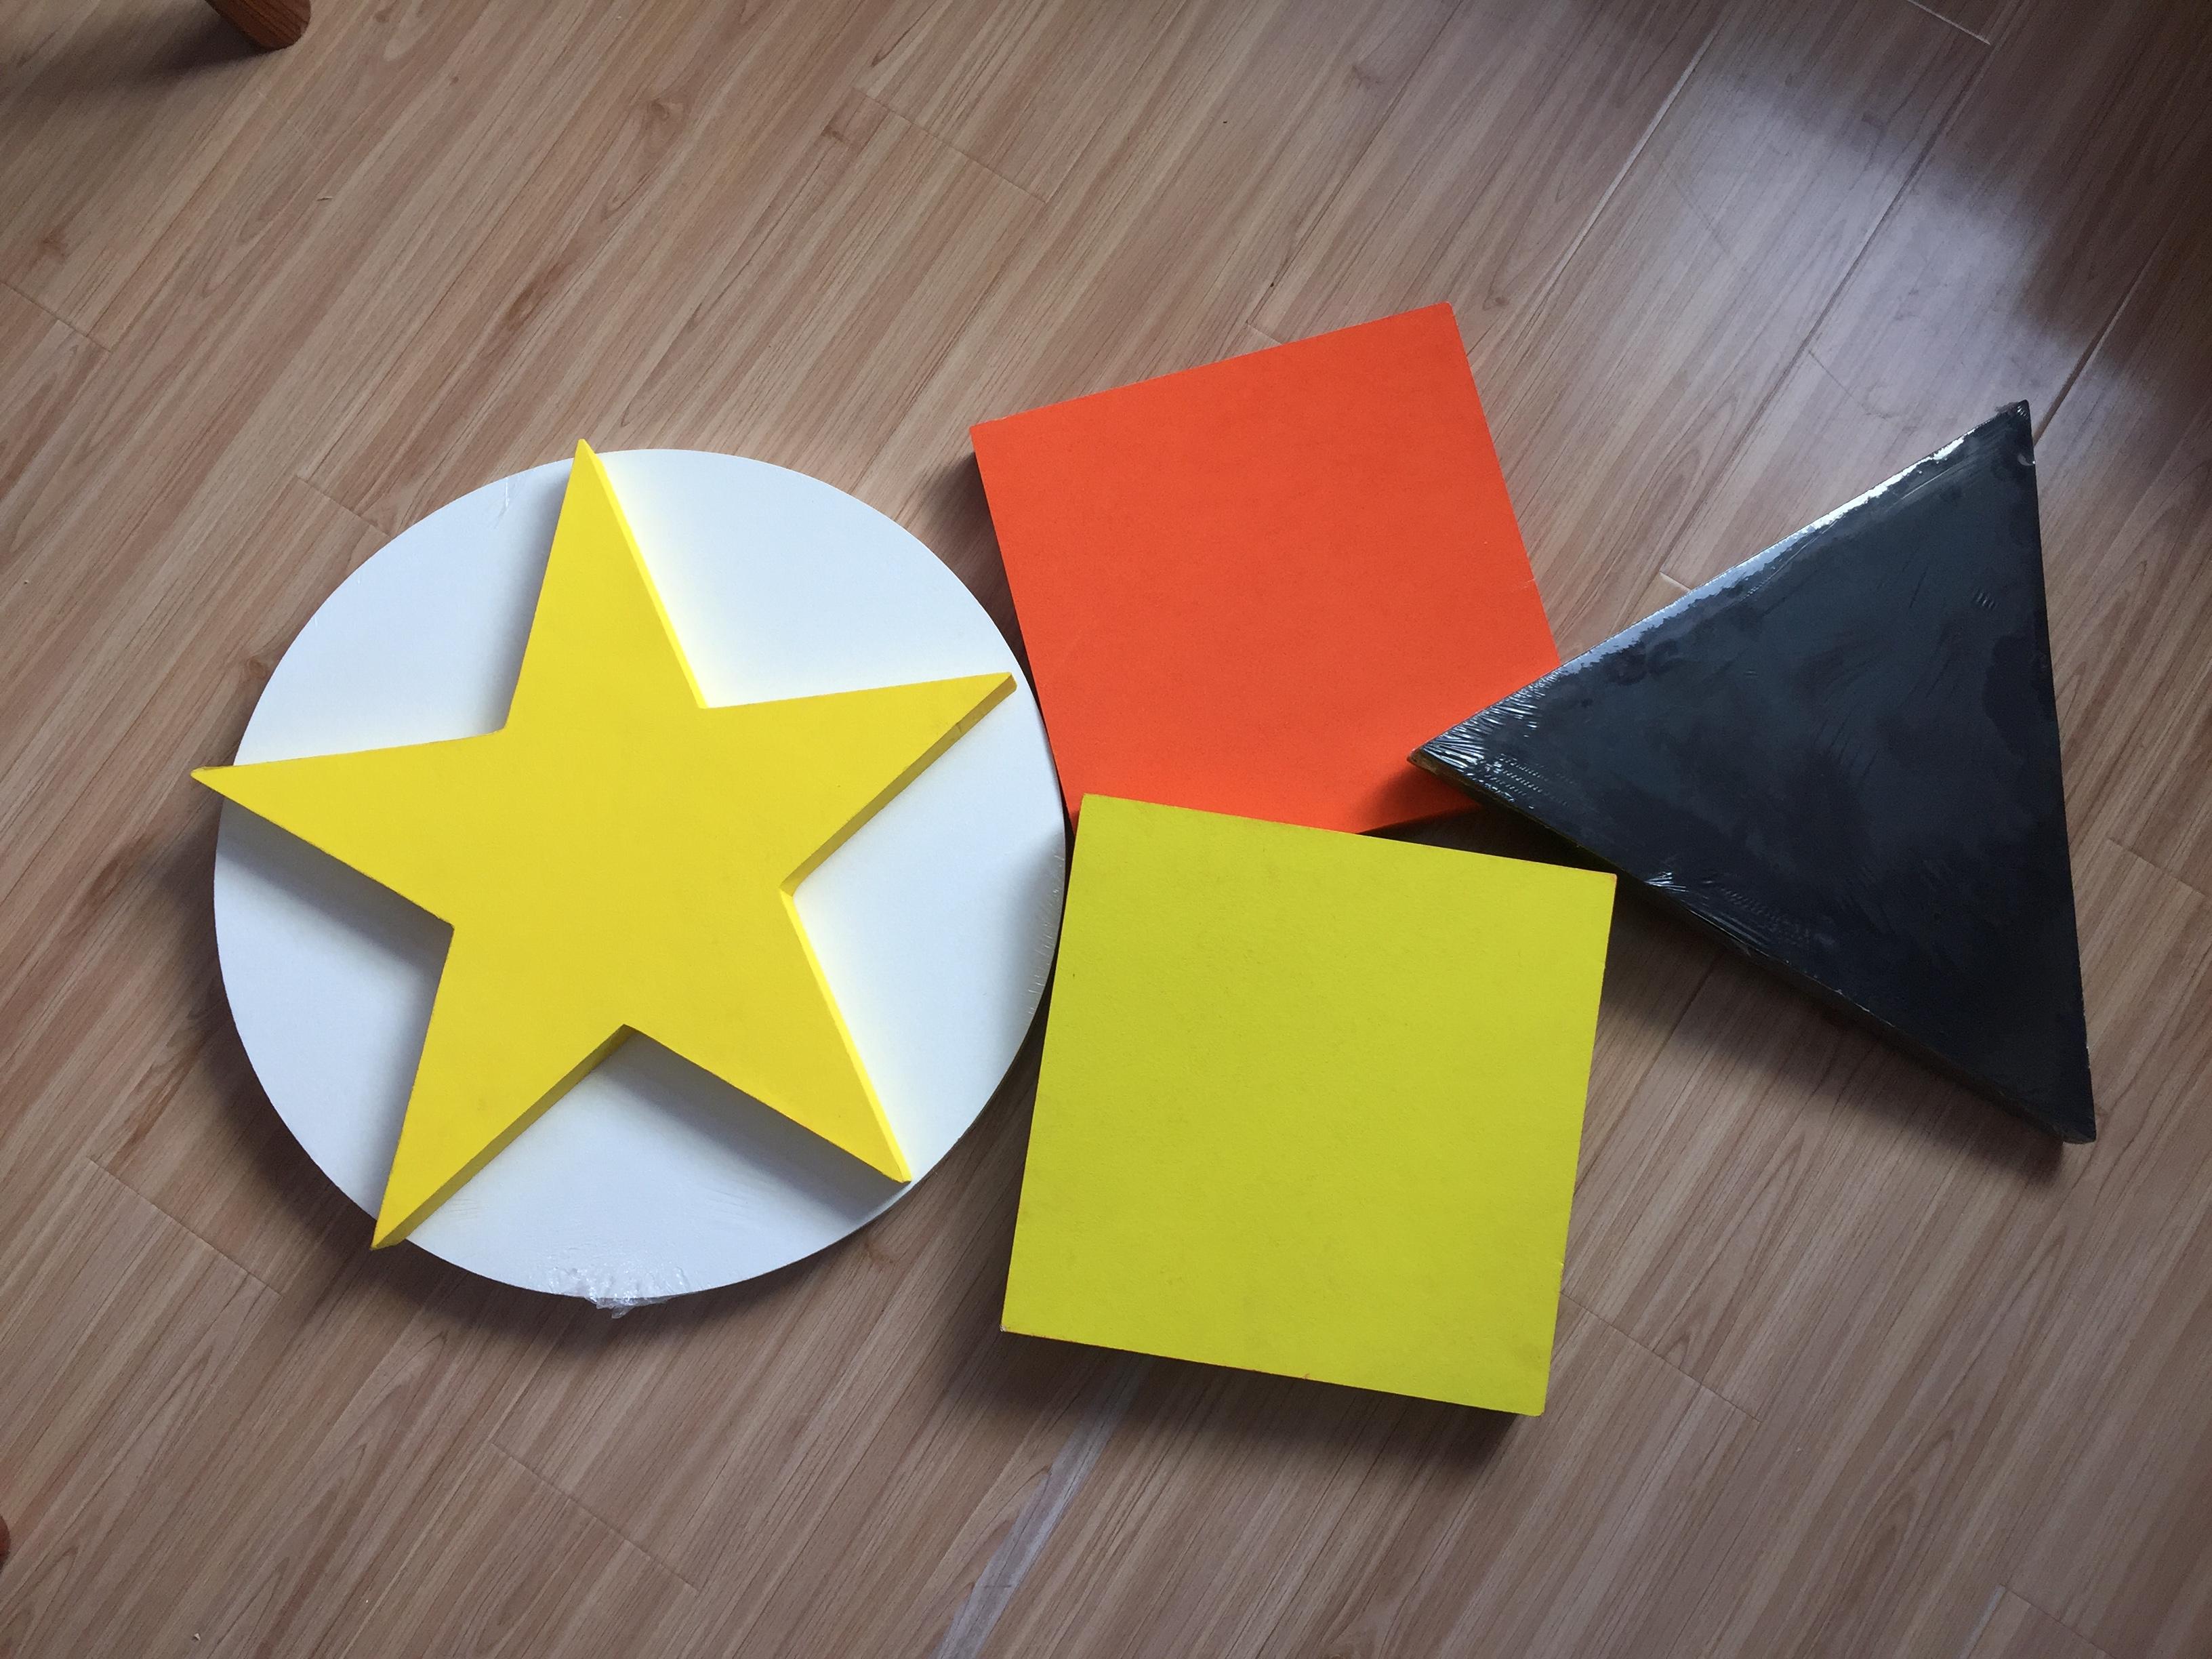 Square Fireproof Ceiling / Fiberglass Ceiling Tiles / Artistic ...